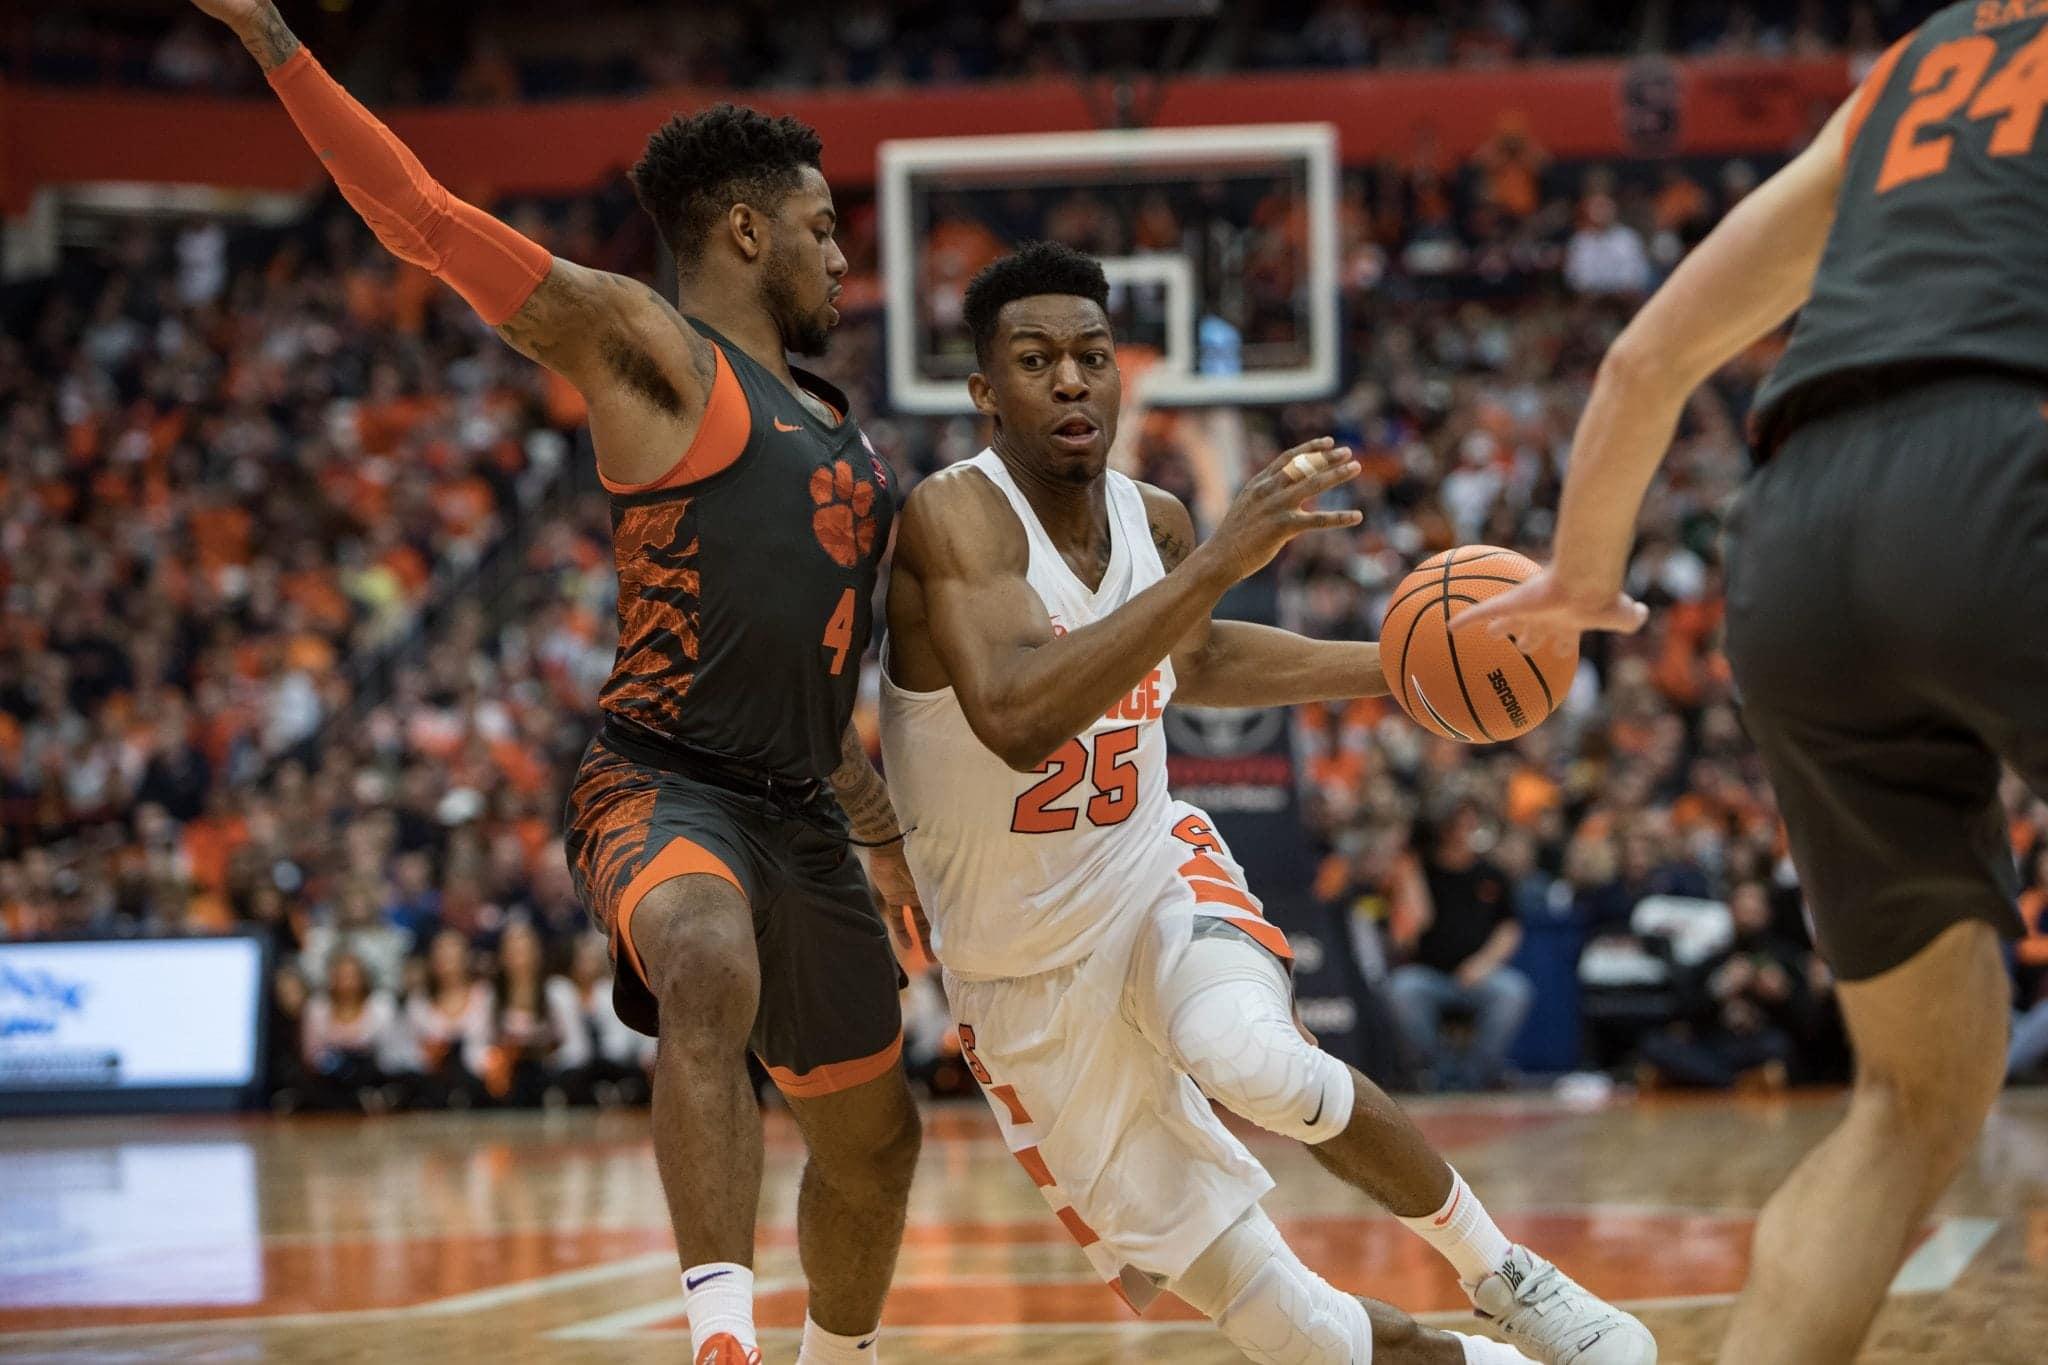 Tyus Battle drives toward the basket against Clemson